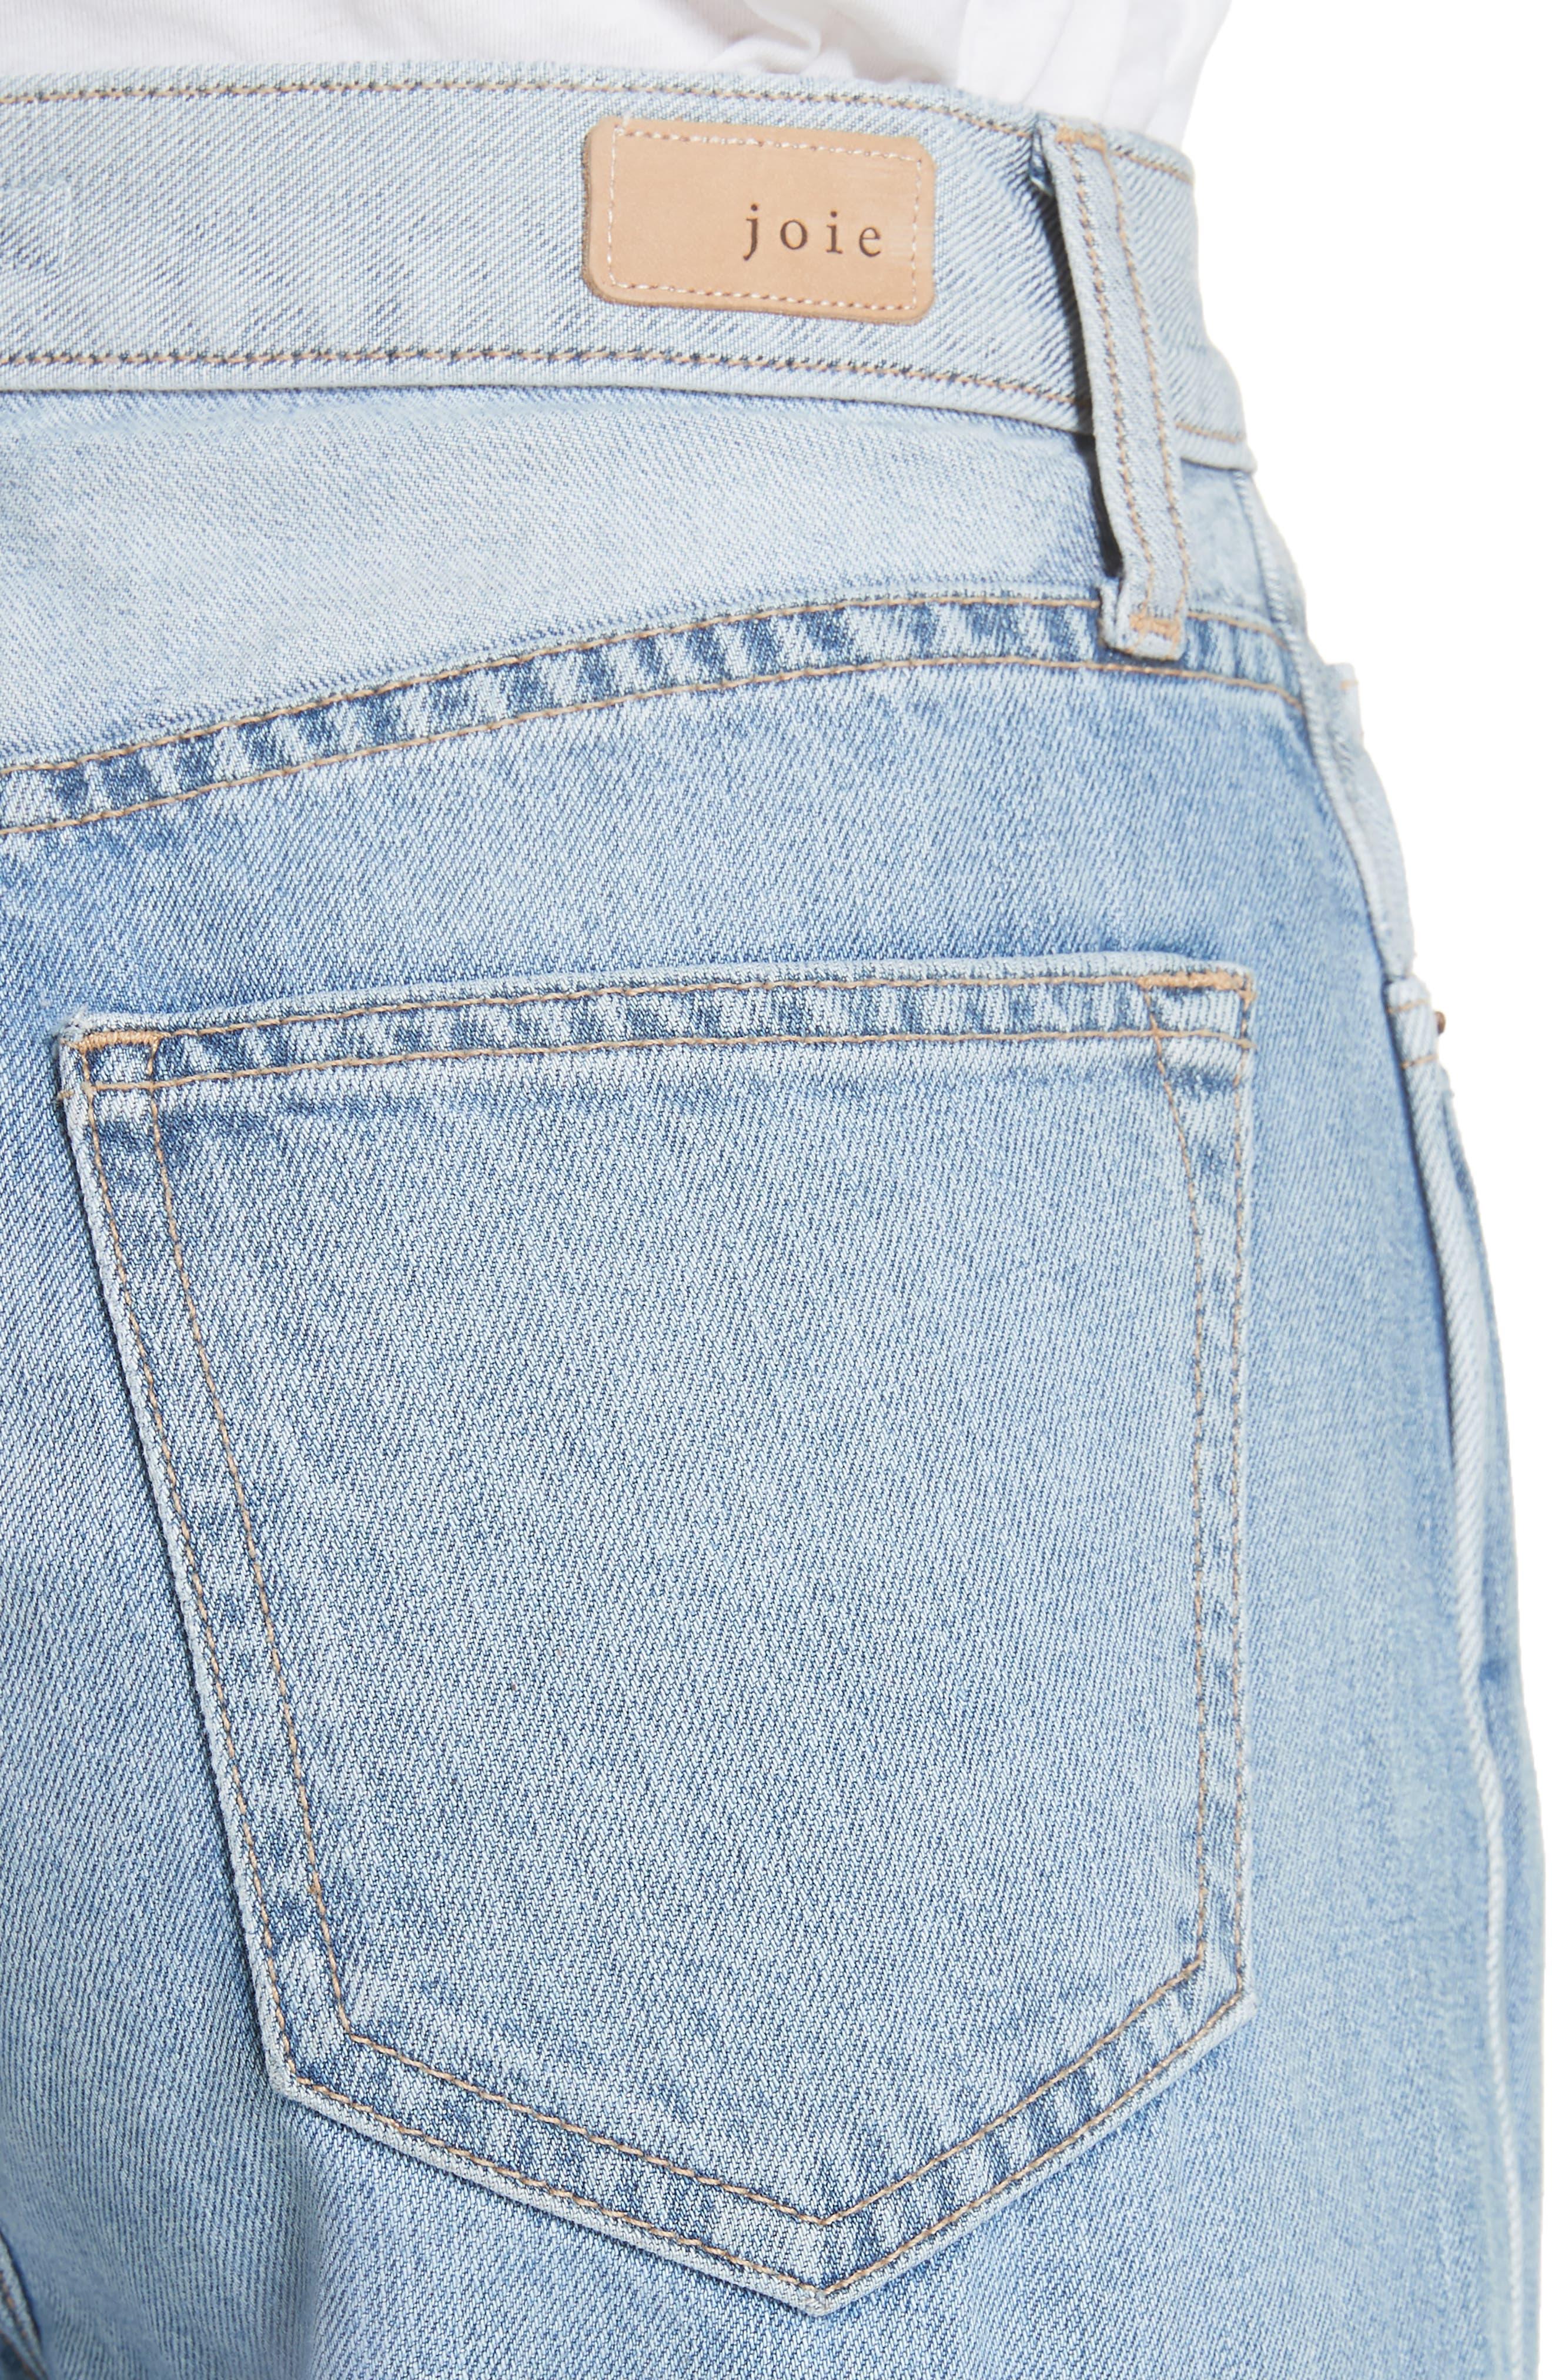 Isemene Wide Leg Jeans,                             Alternate thumbnail 4, color,                             450